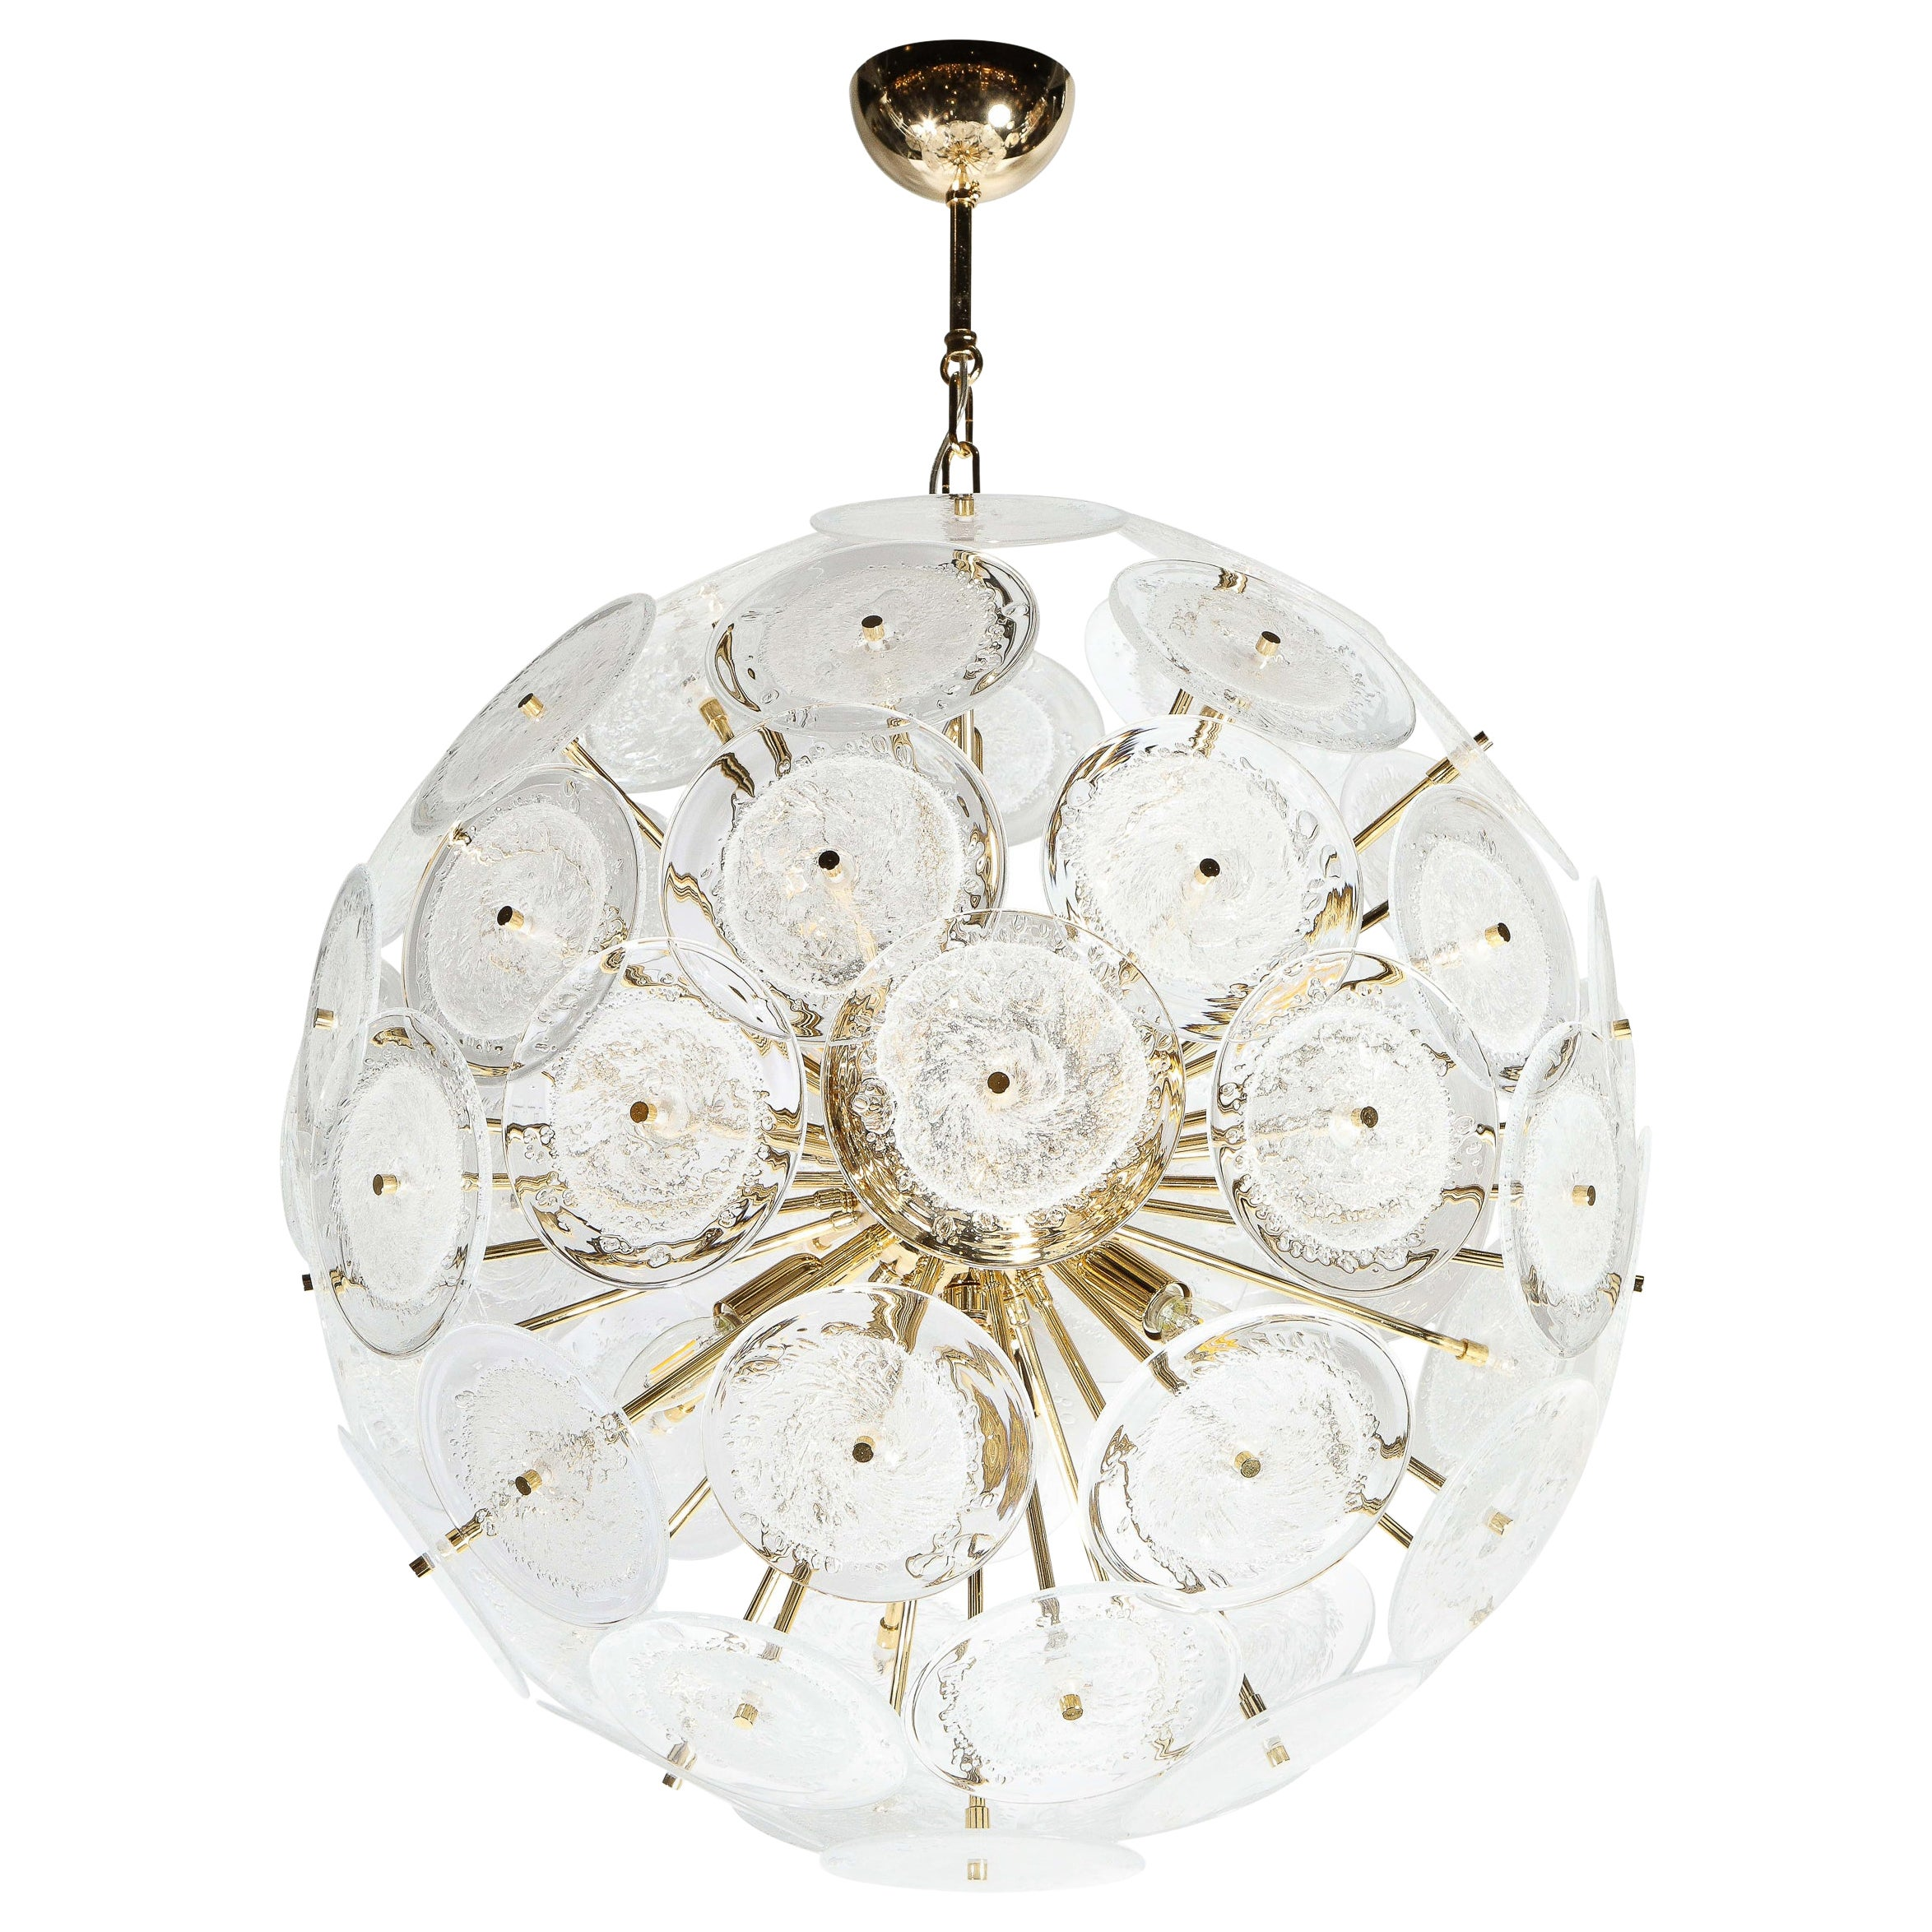 Polished Brass Sputnik Chandelier with Hand Blown Translucent Murano Glass Discs